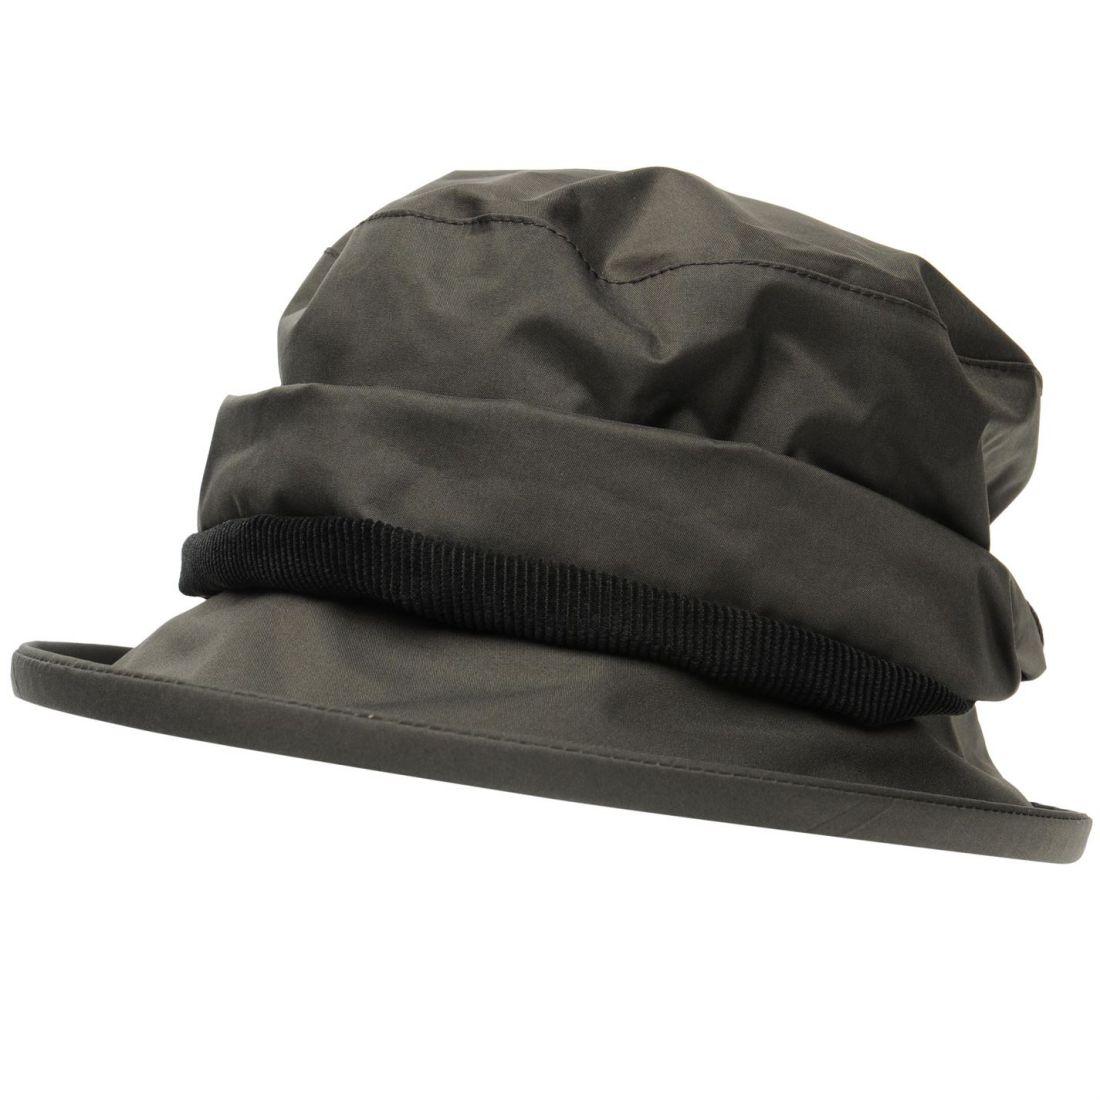 20c3e4cc7e2 Jack Murphy Mens Waterproof Hat Malvern Robinsons New